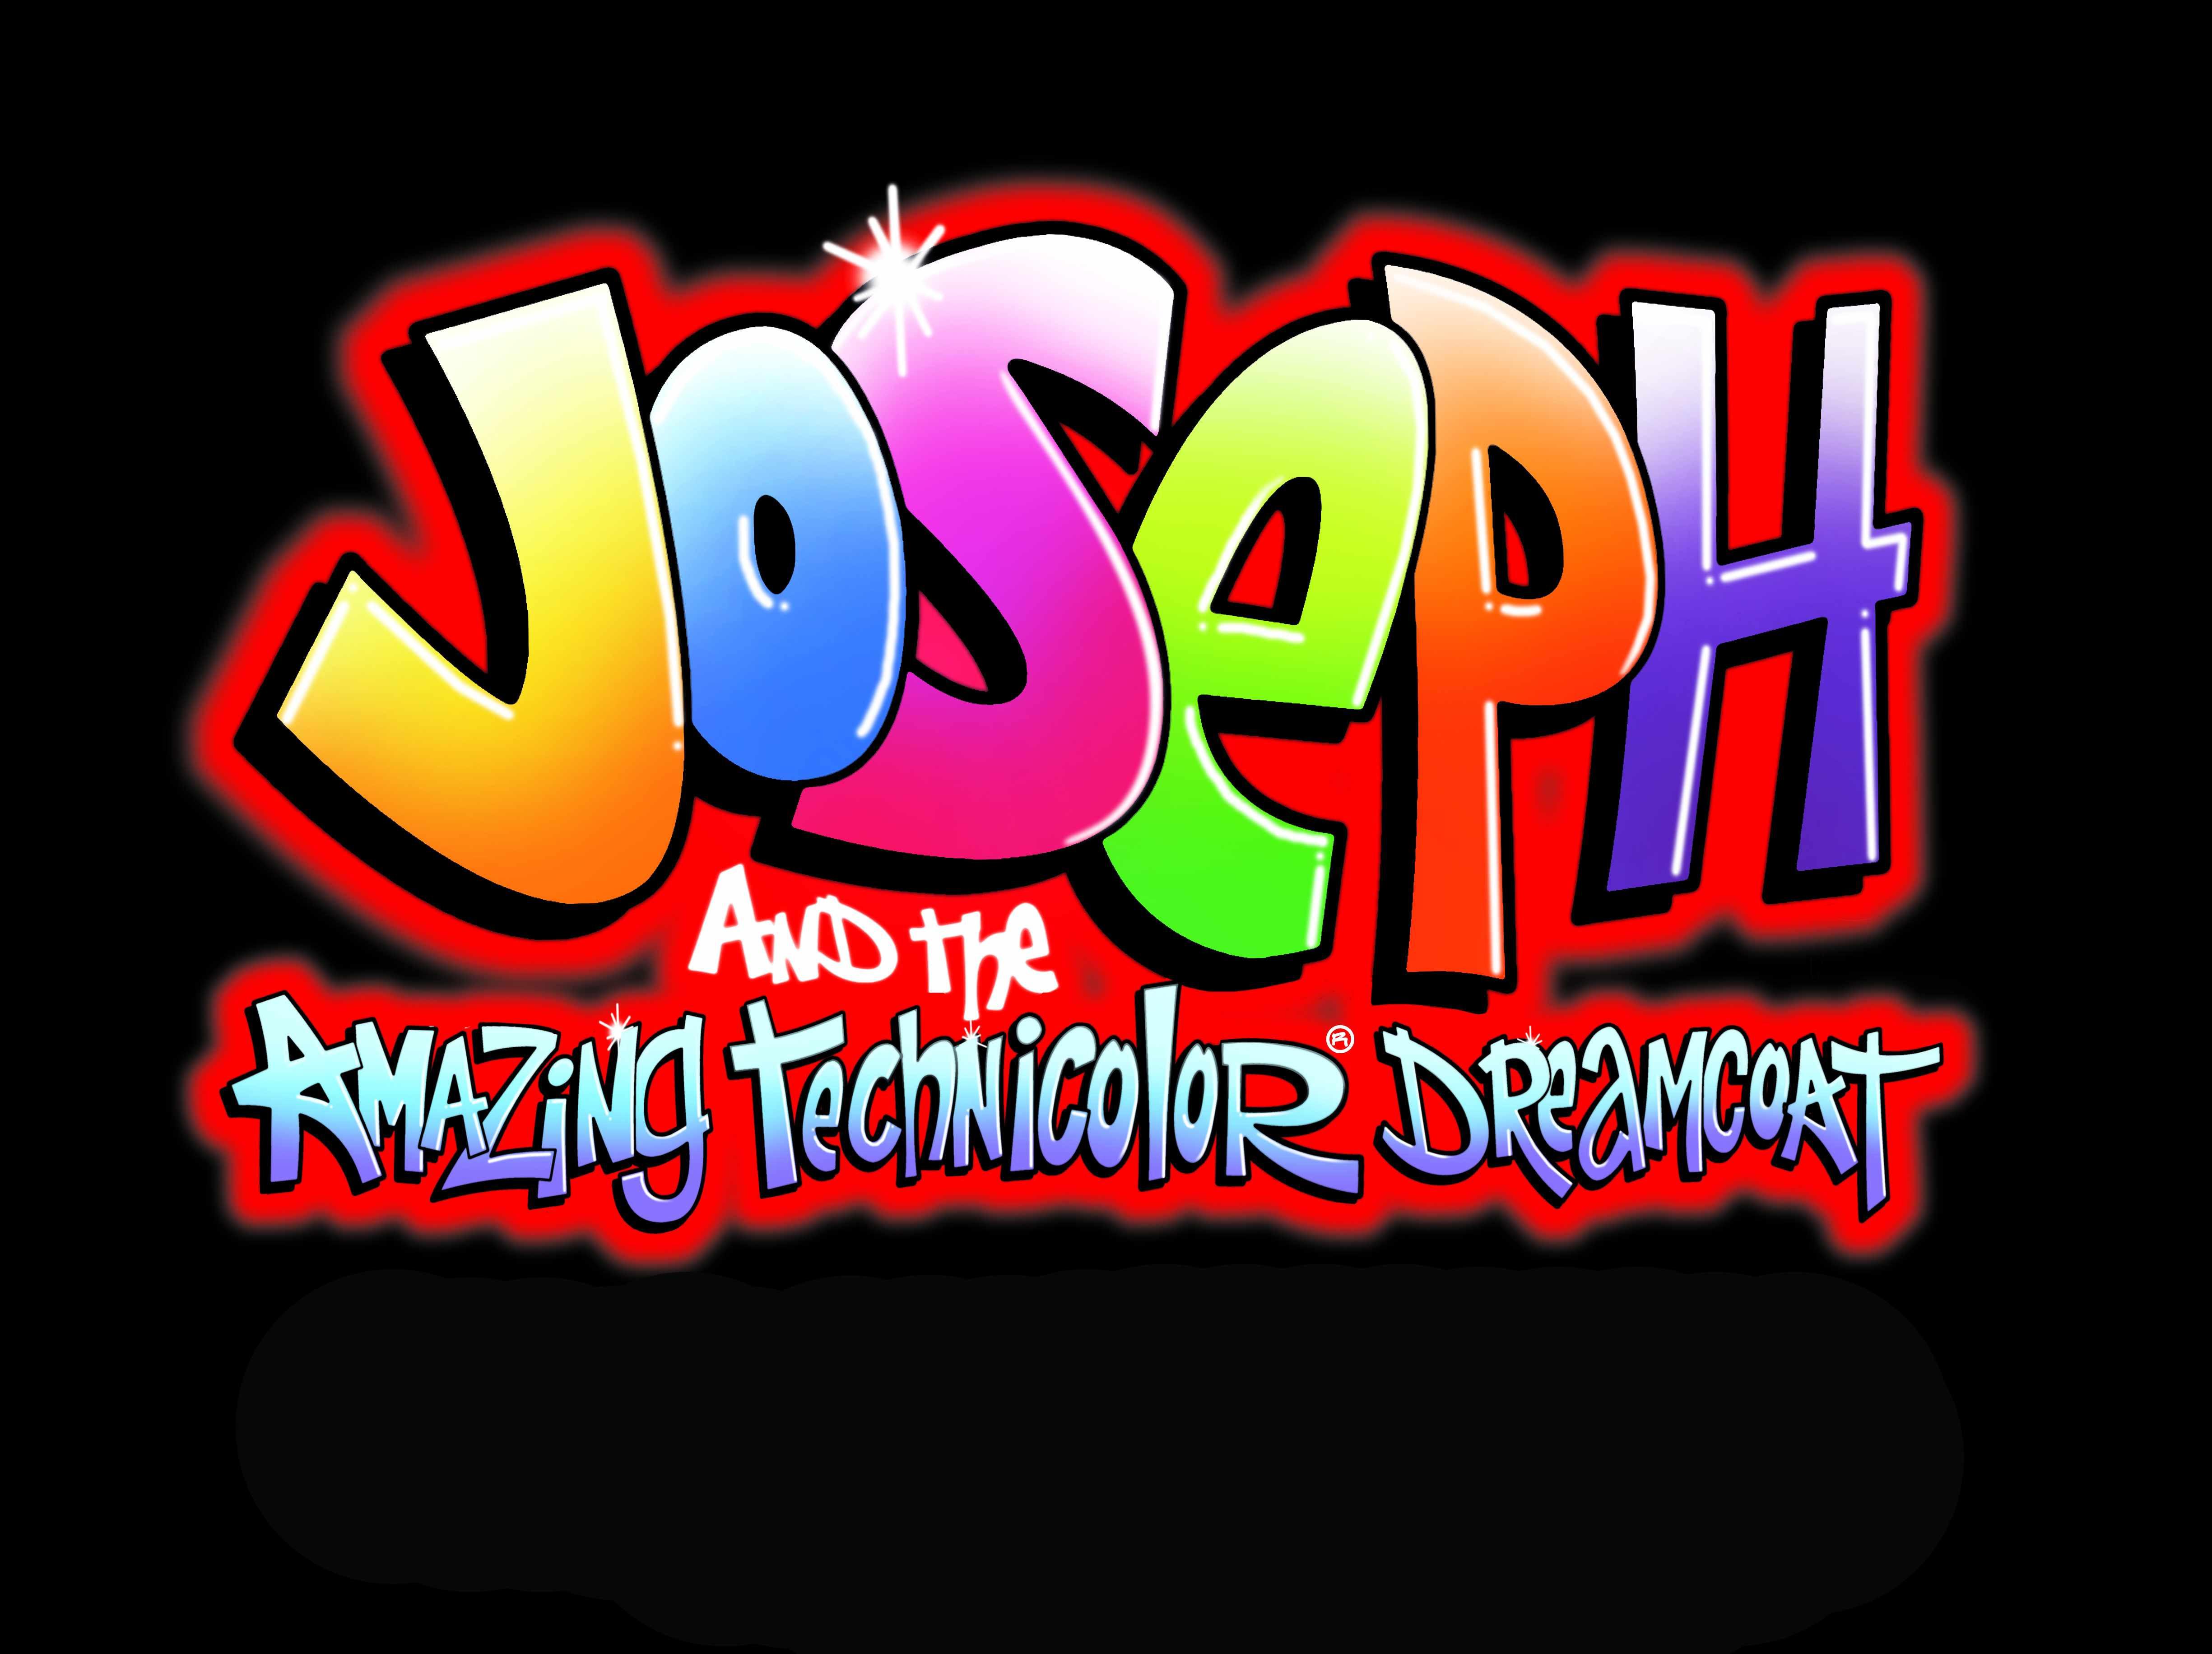 Audition for Joseph